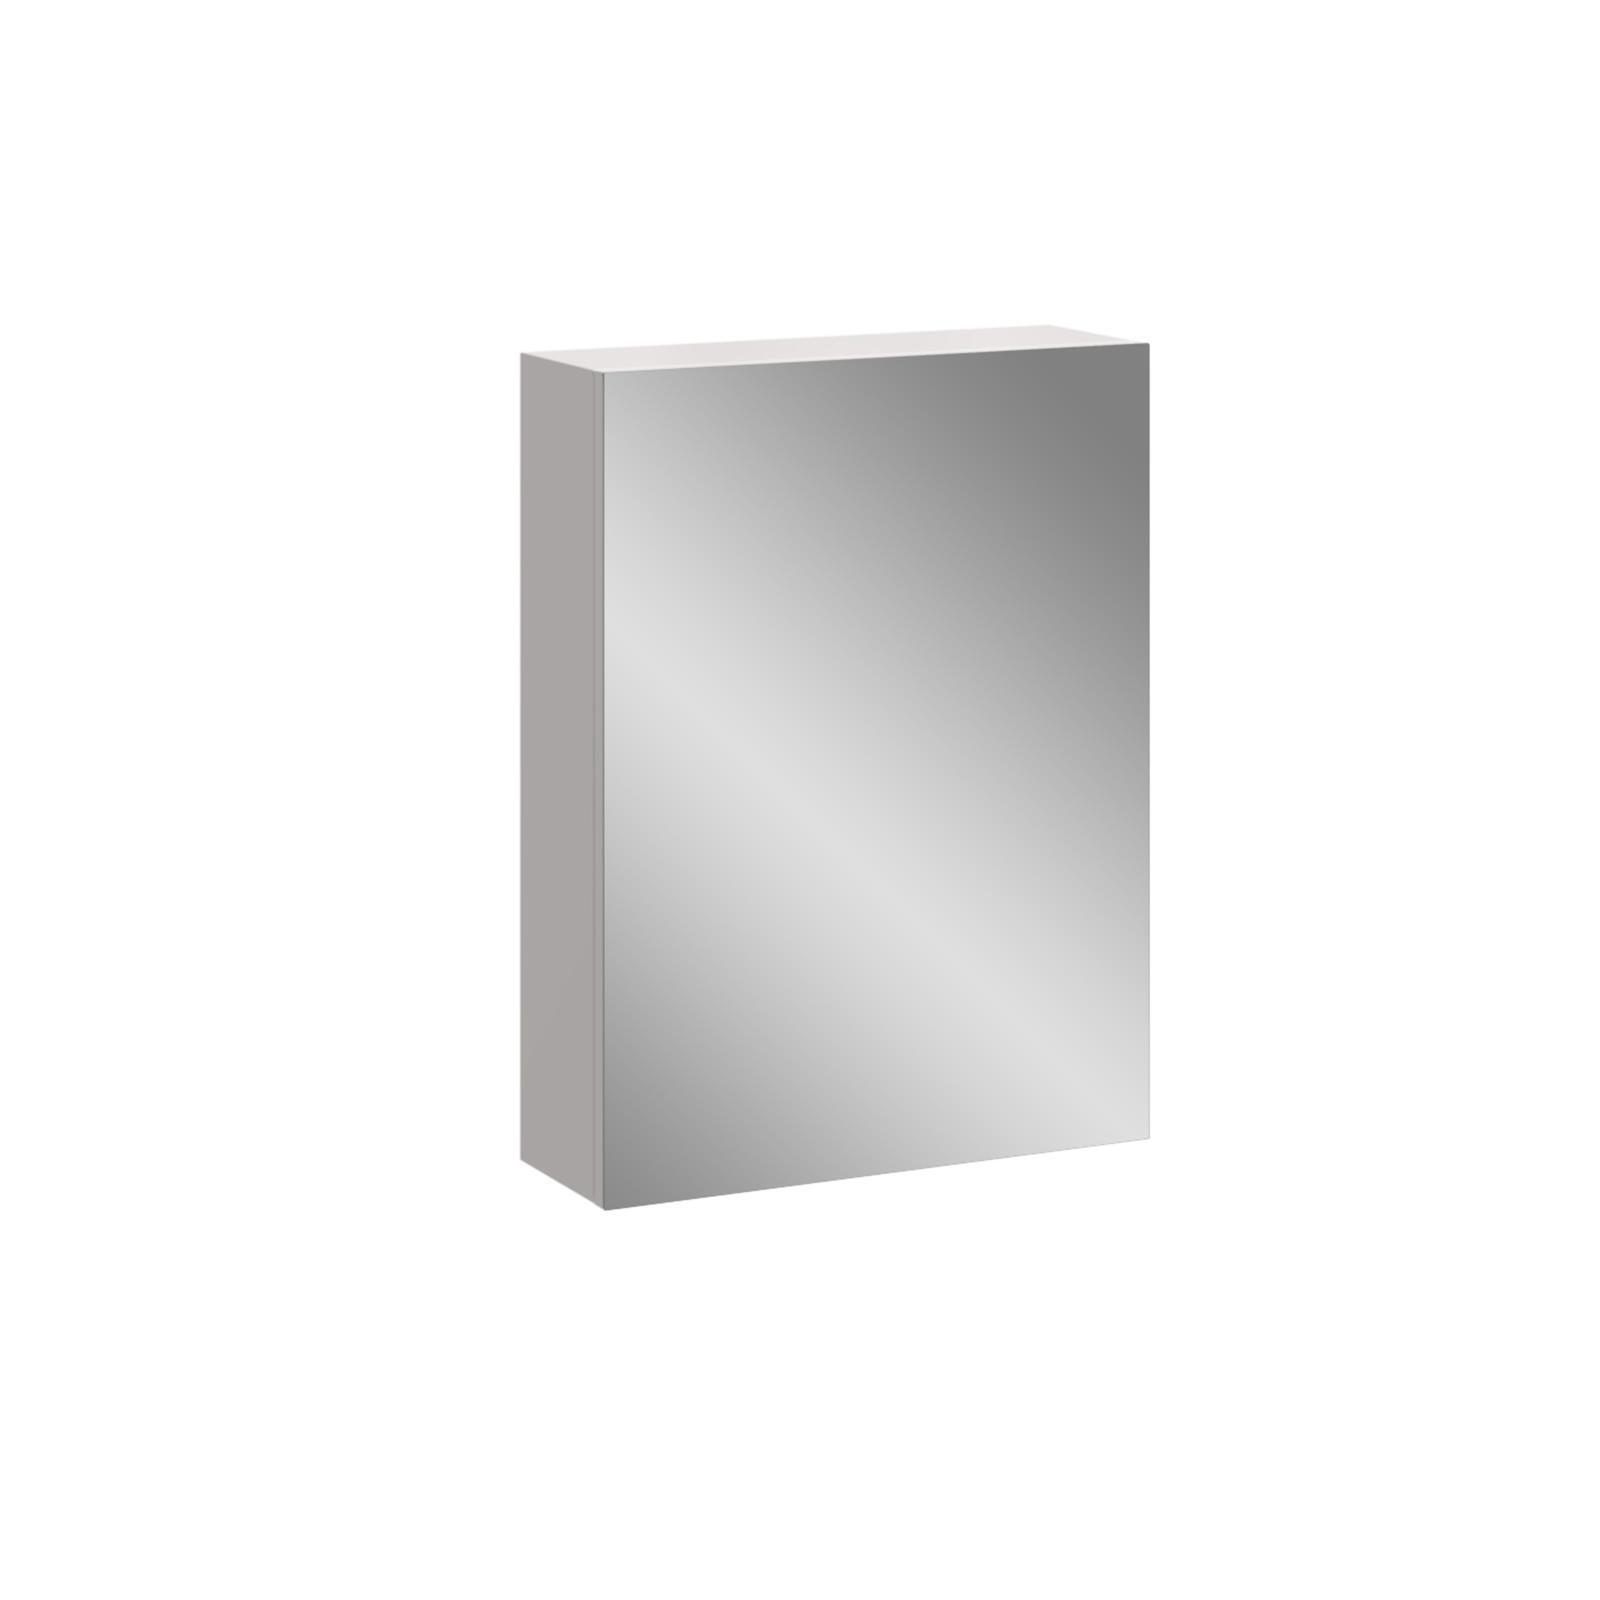 Stein 450 x 600mm White Stylo Bathroom Cabinet With Mirror Door